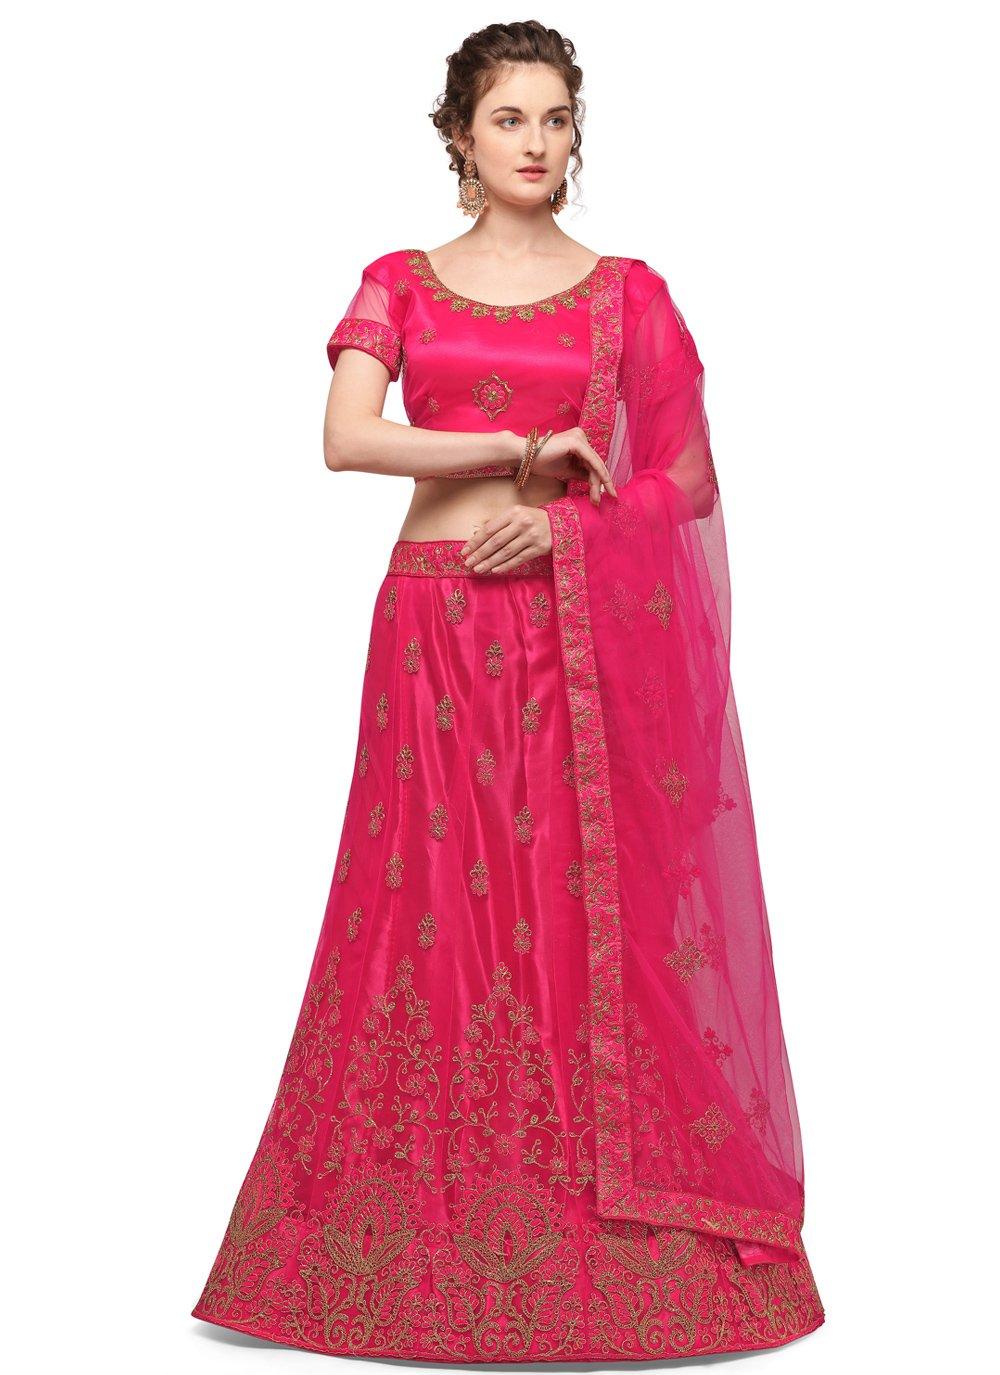 Net Embroidered Pink Lehenga Choli